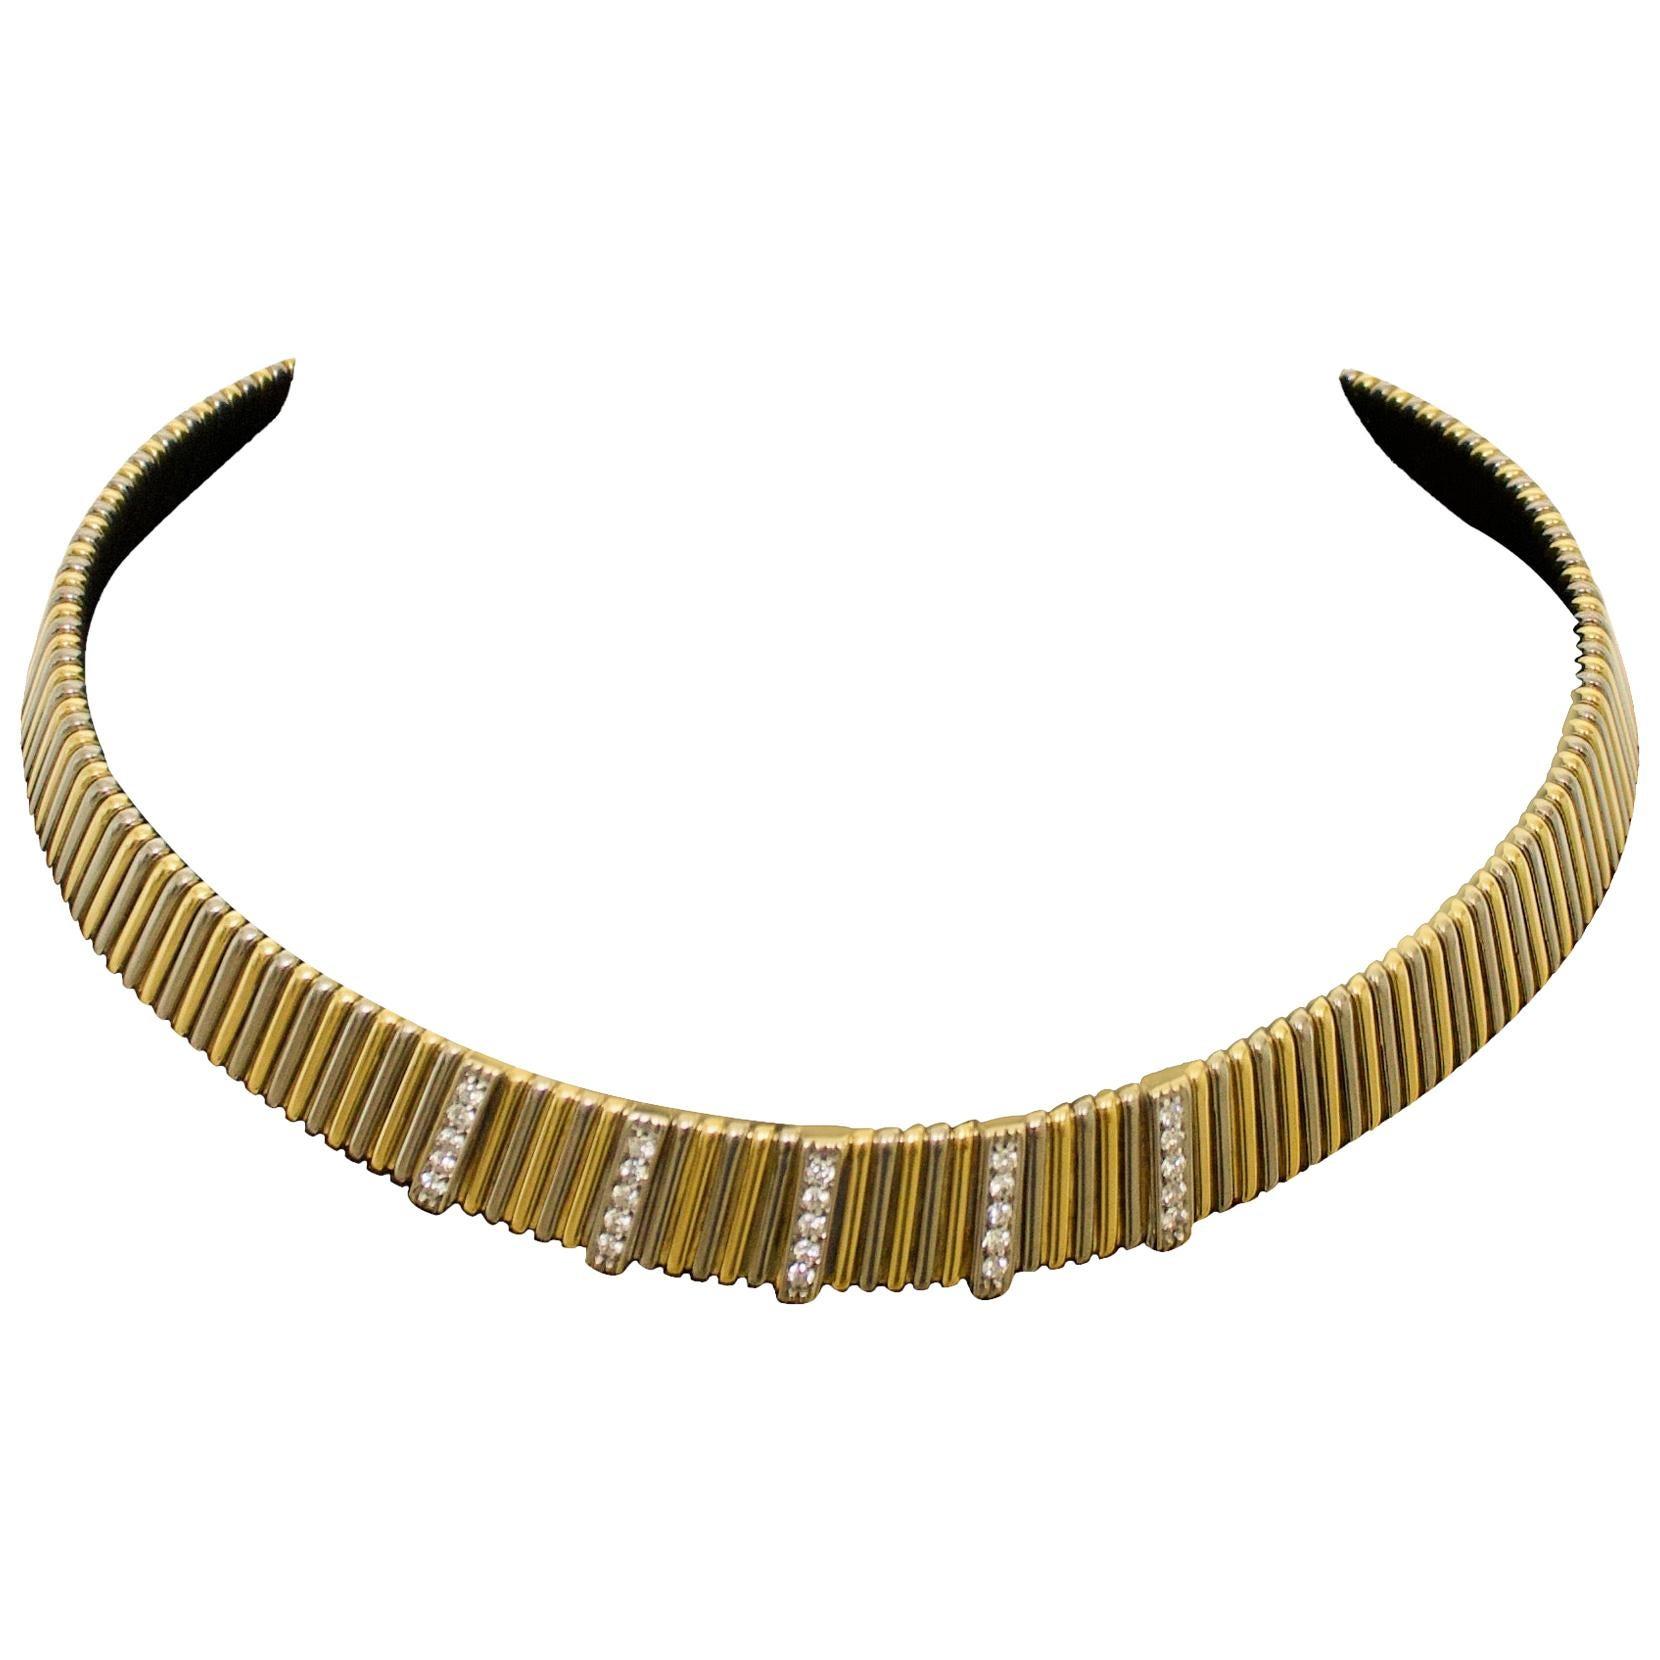 Diamond Necklace in 18 Karat Yellow Gold 3.8 oz